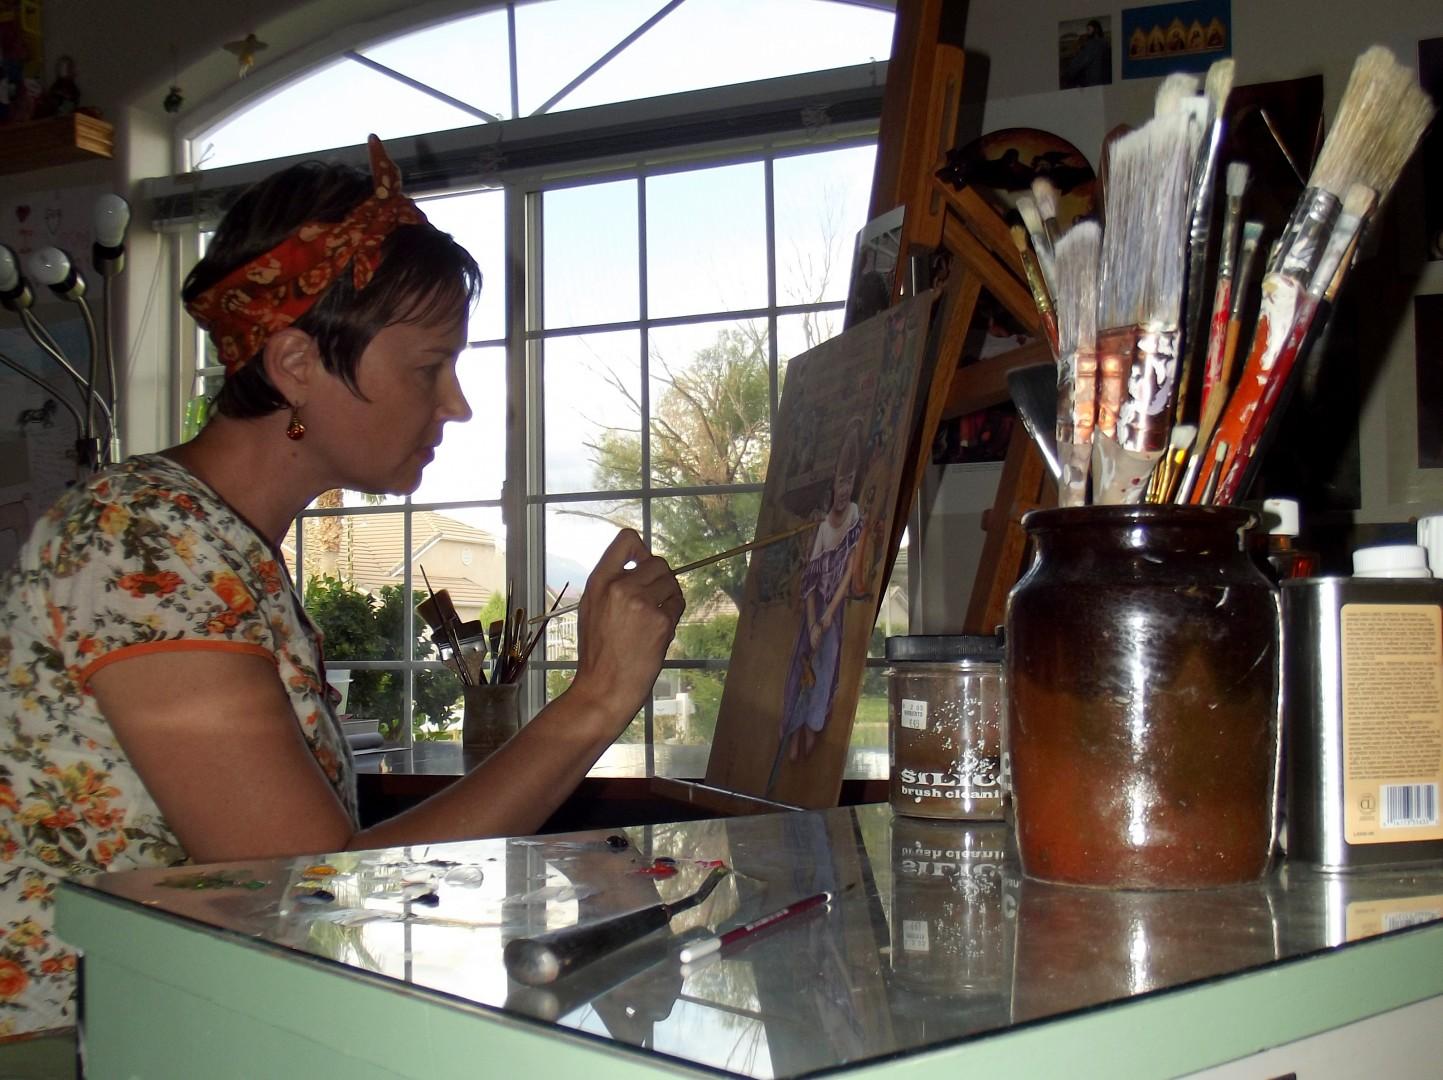 Kirsten Beitler, featured artist in the Arts to Zion tour Jan. 17-20, 2014, St. George, Utah | Photo courtesy of Arts to Zion tour, St. George News